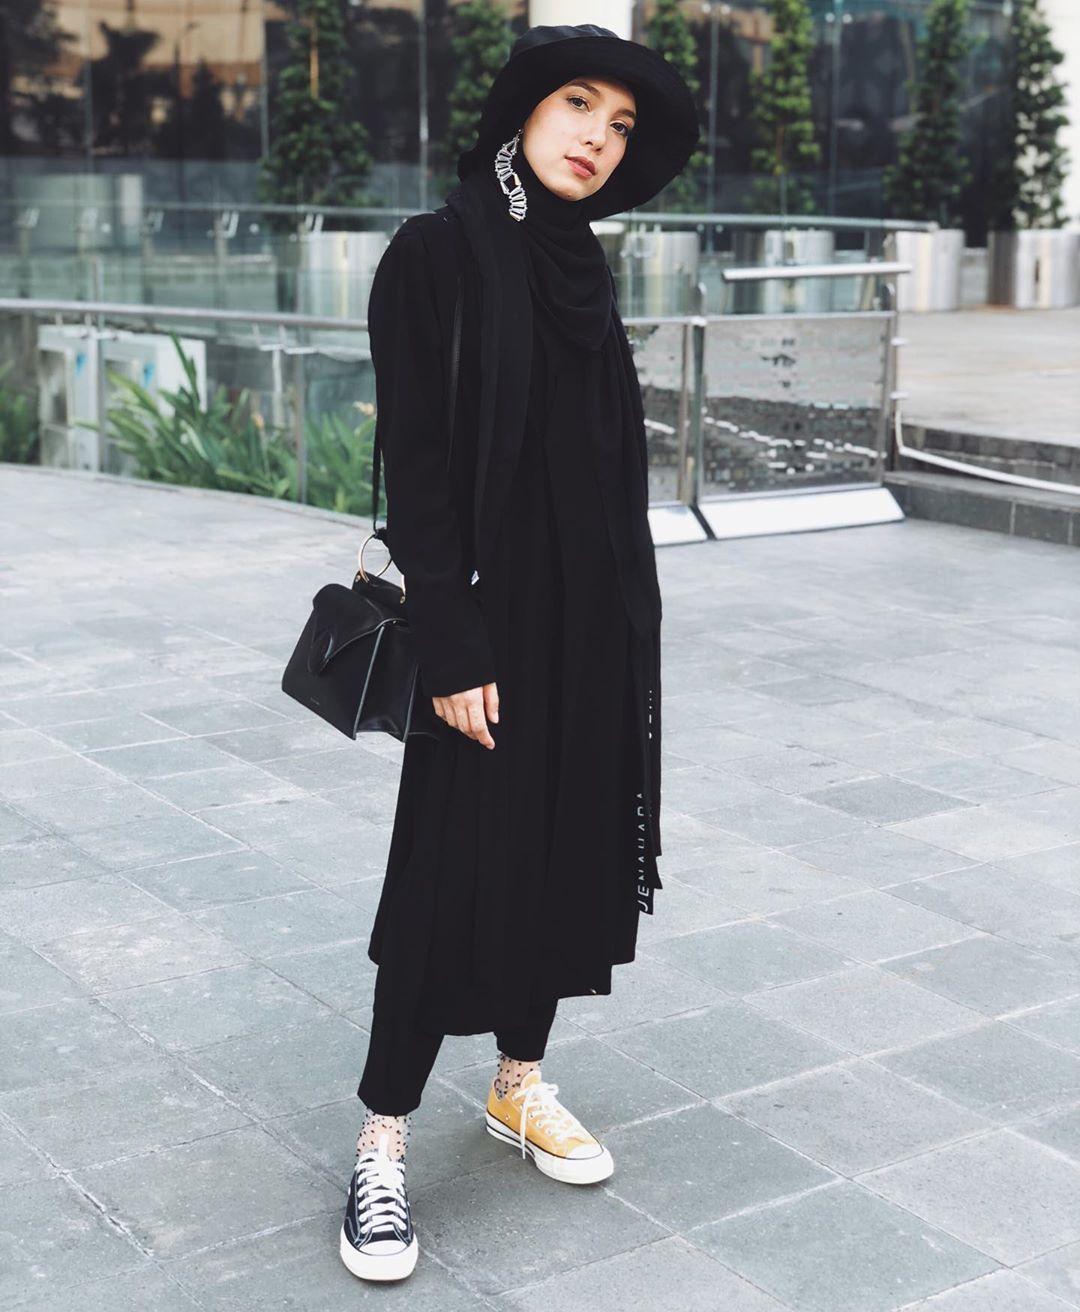 Kata Jenahara Nasution Soal Trend Hijab & Koleksi Serba Hitam